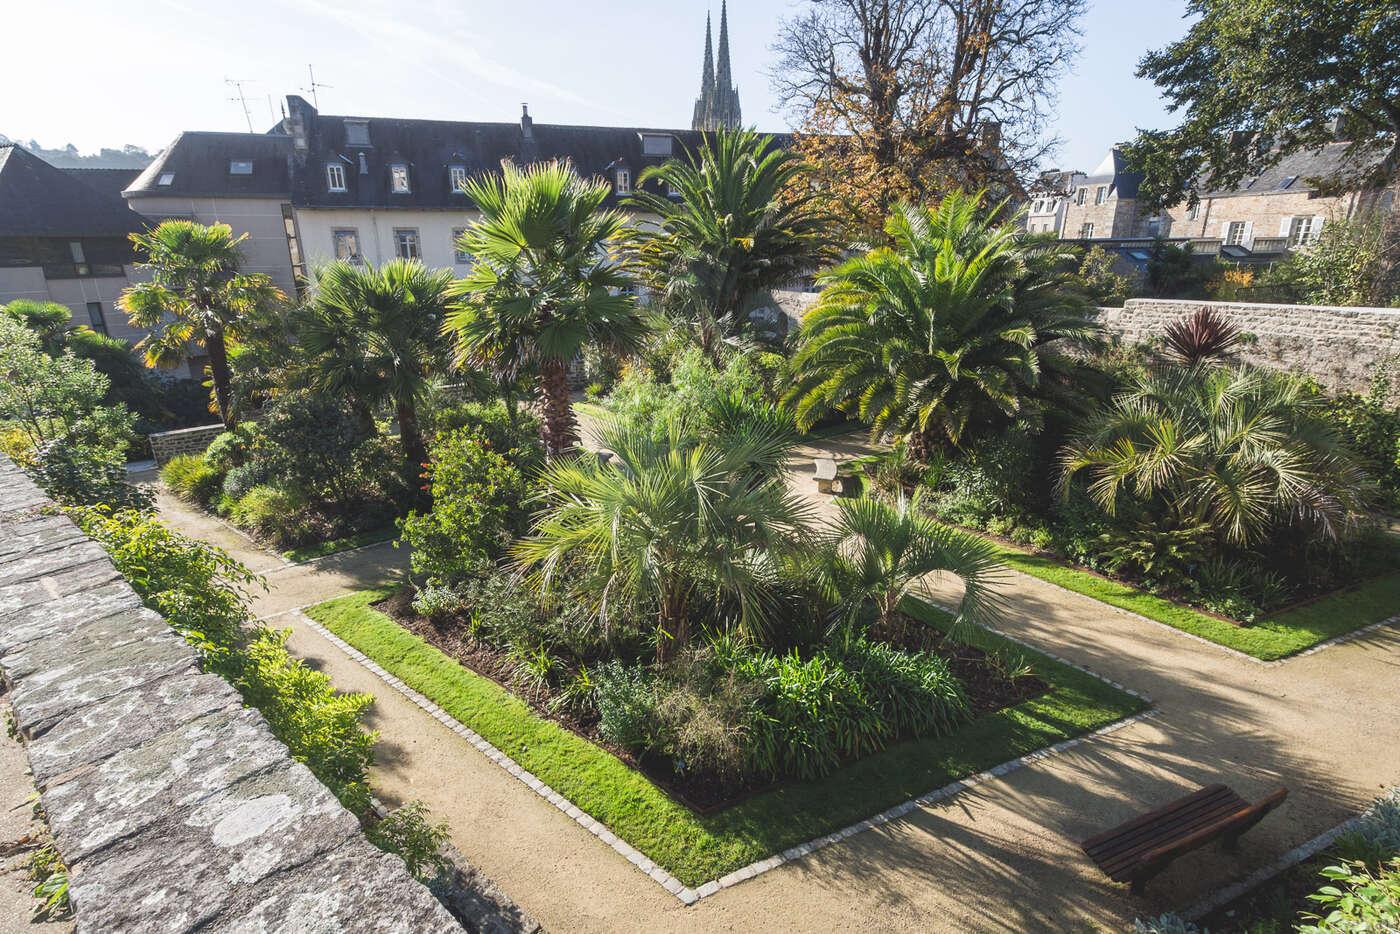 Jardin de la Retraite,Quimper